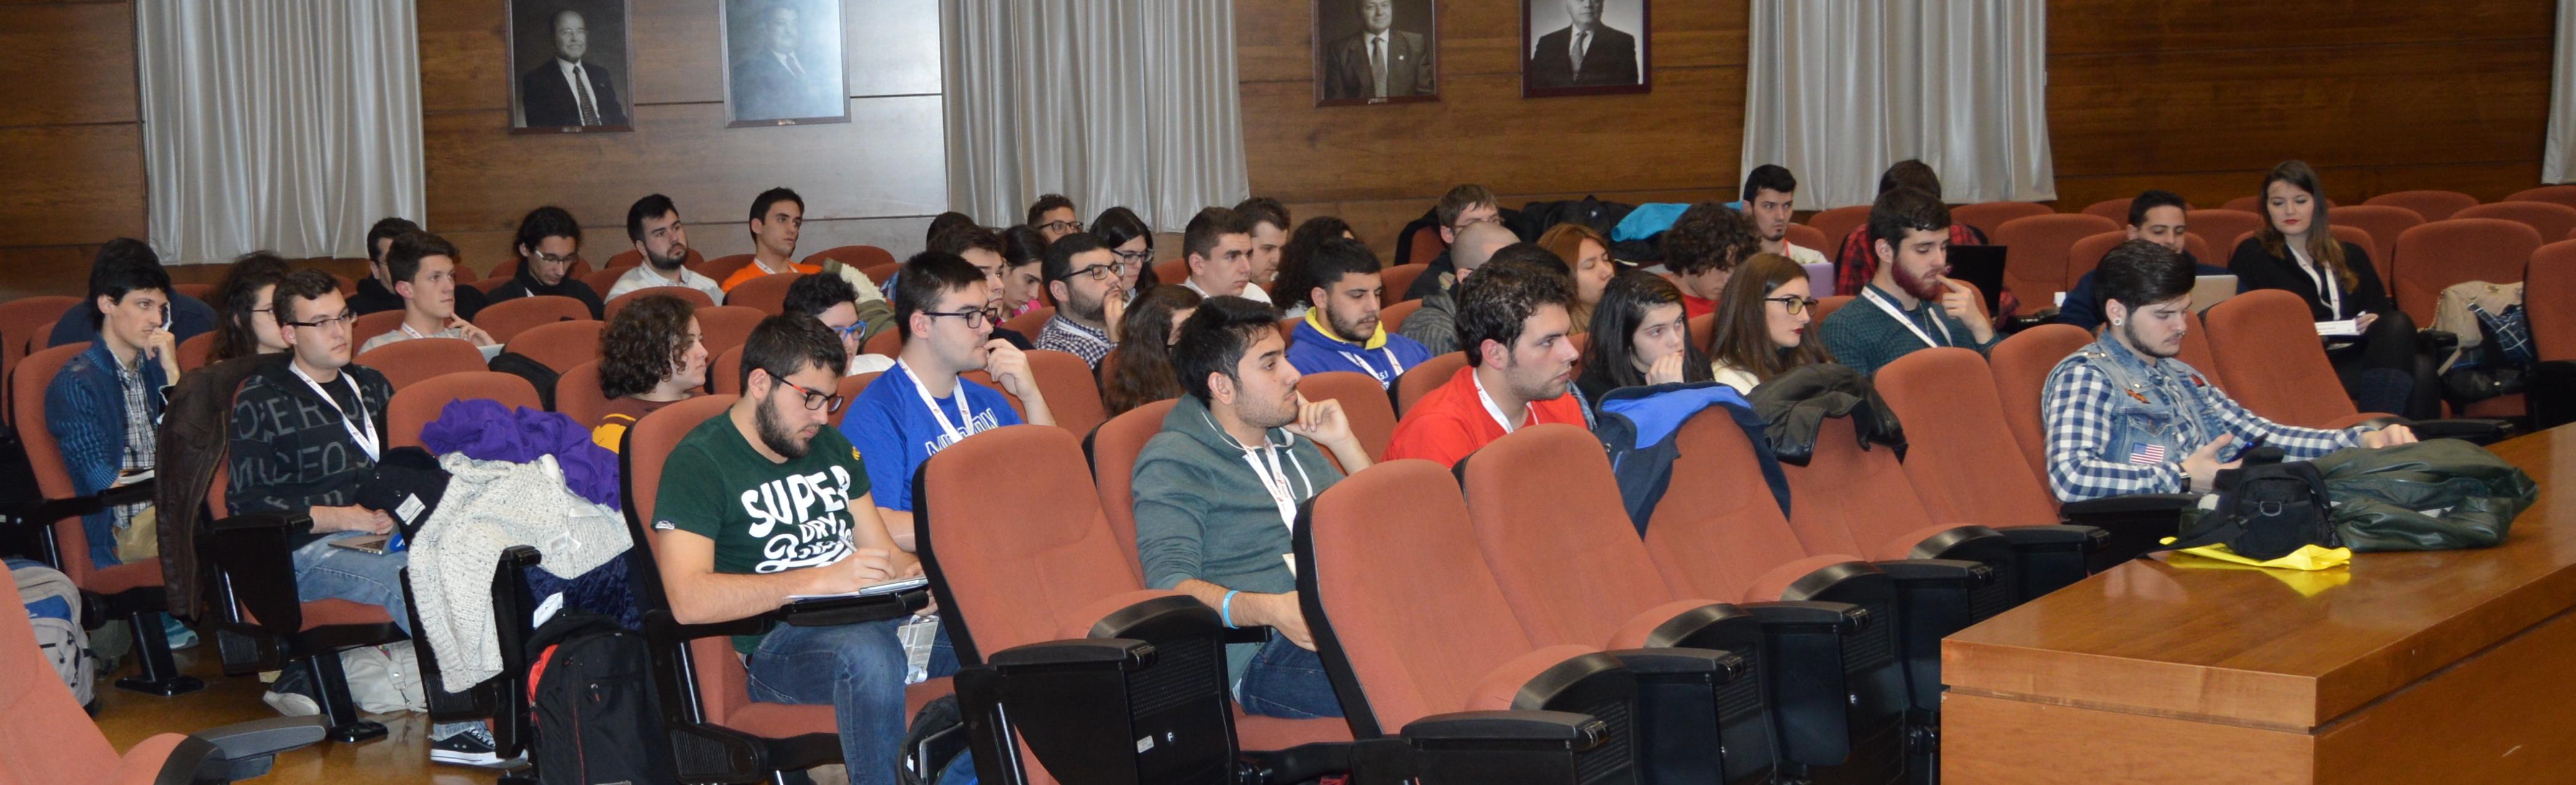 Comienza la XLIV Asamblea General de RITSI en Alcalá